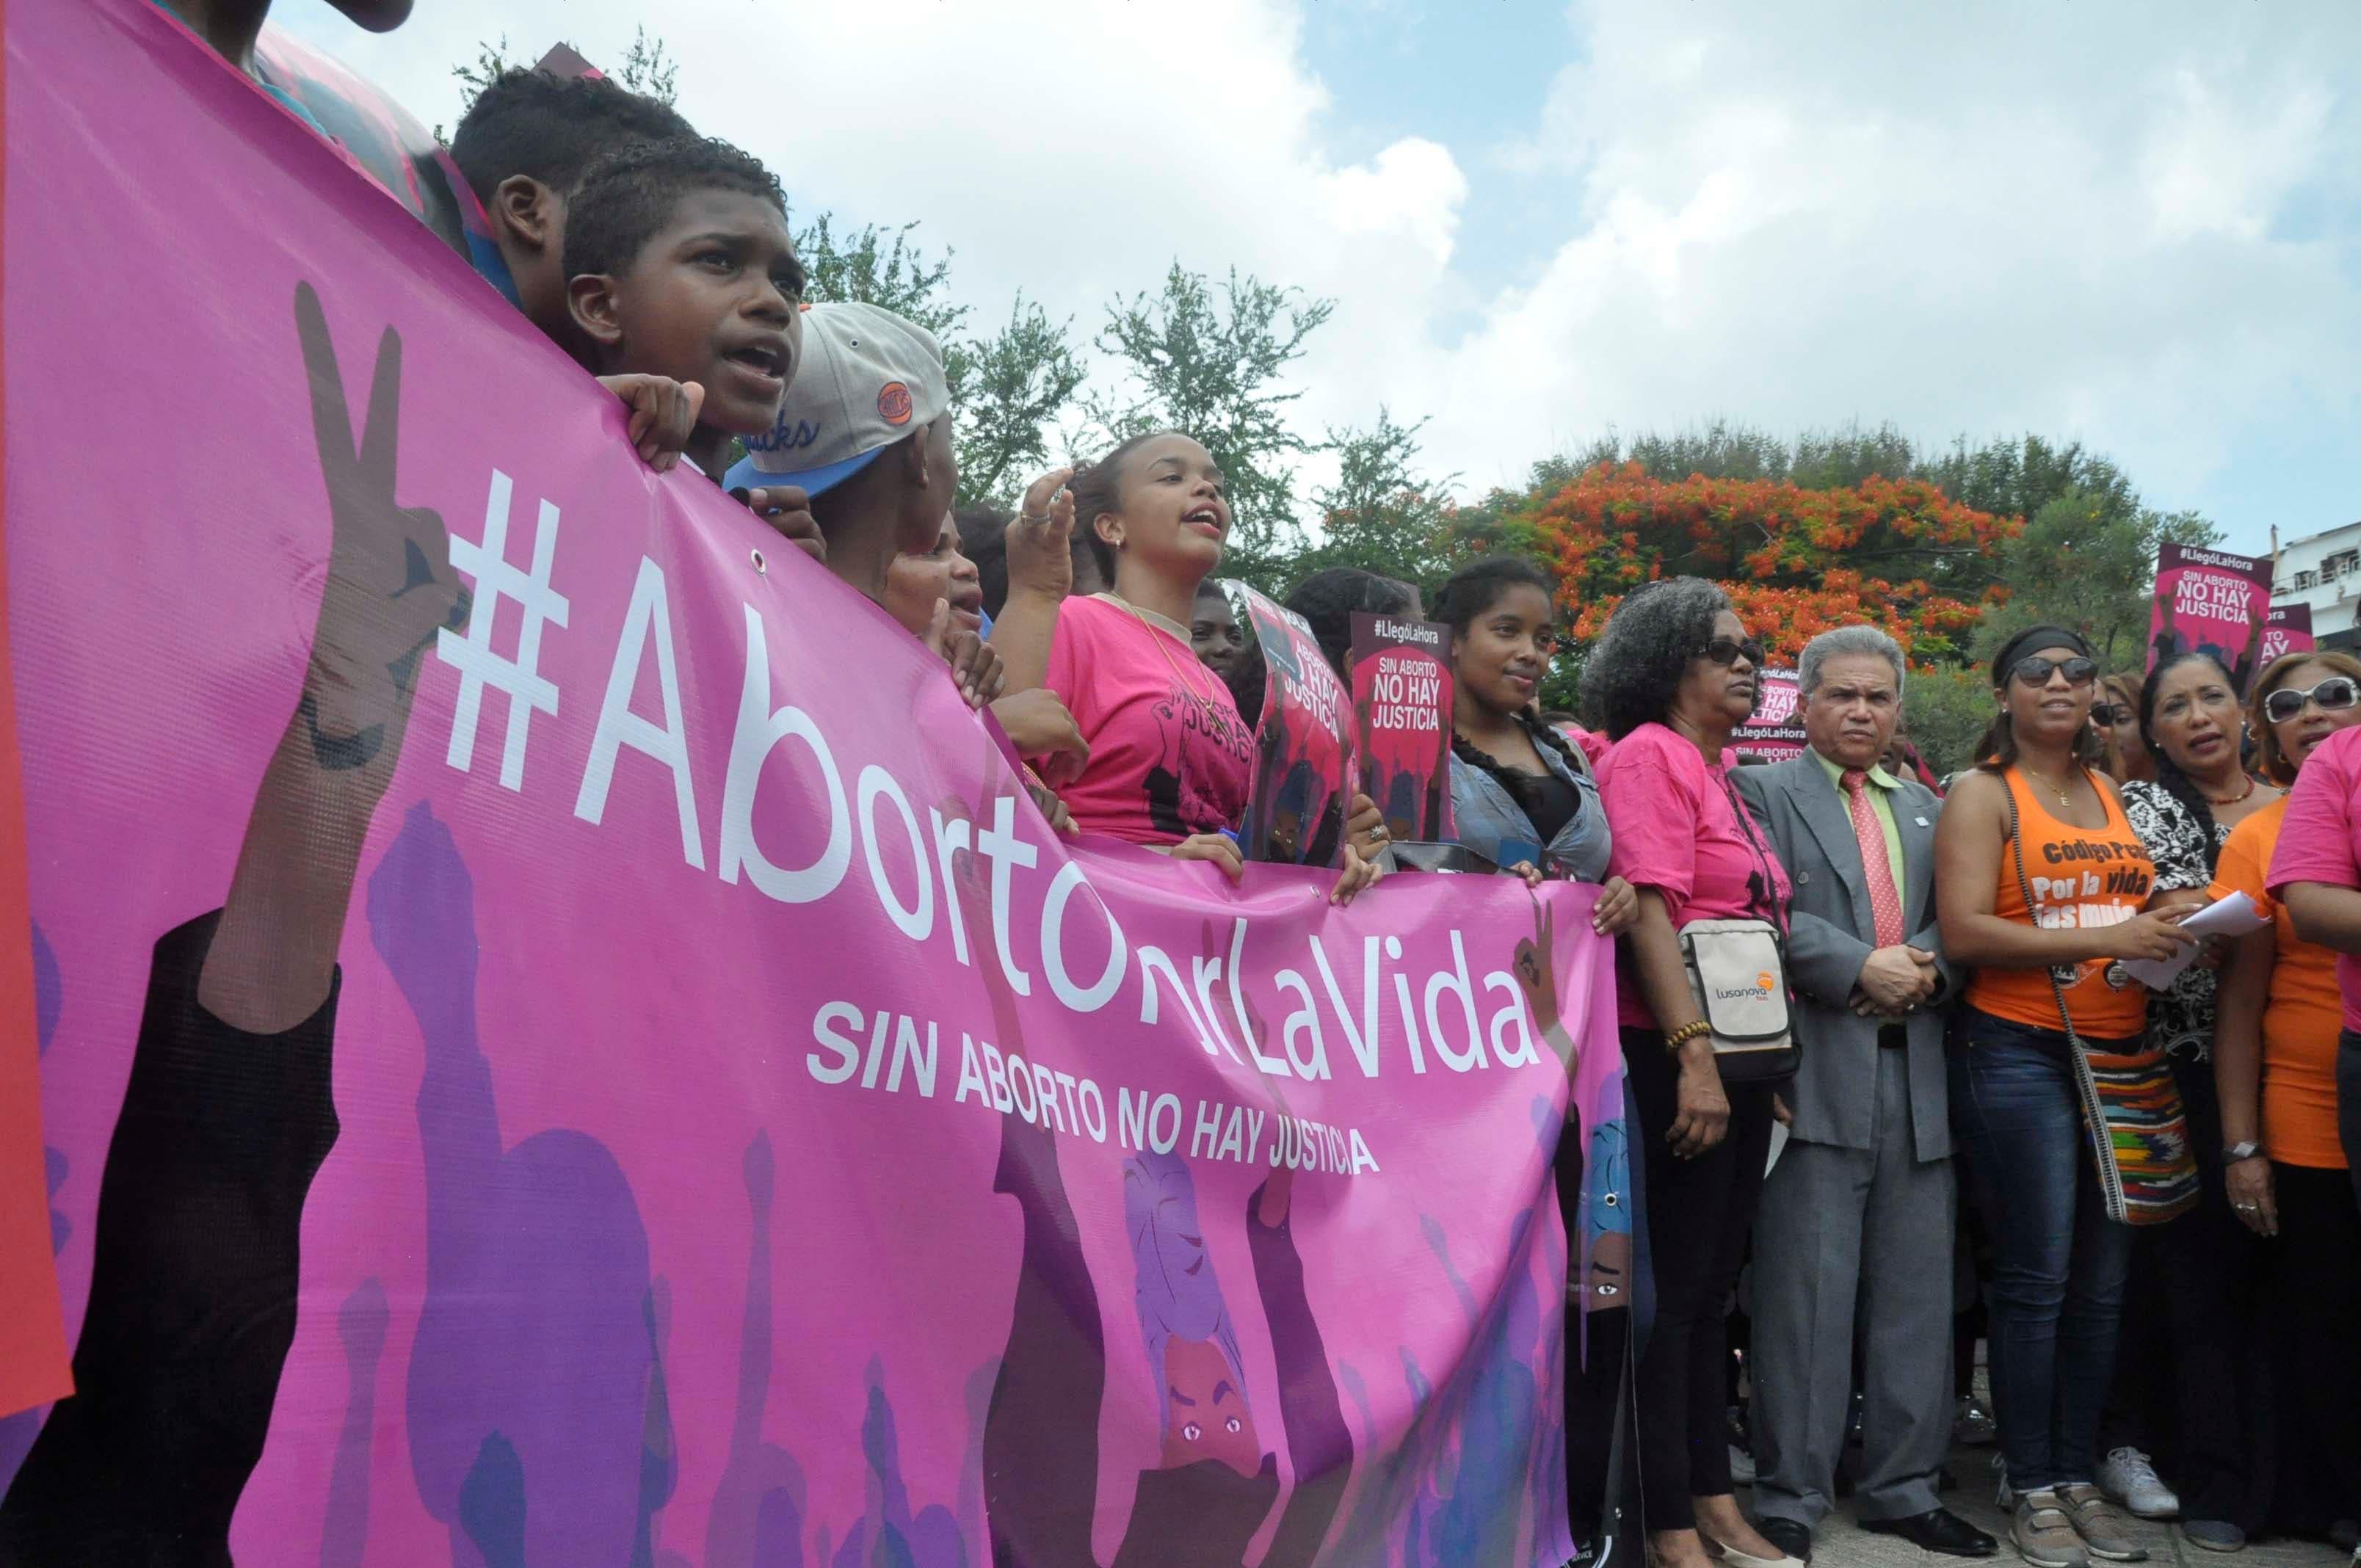 Foro Feminista llama a salvar la vida de mujer embarazada